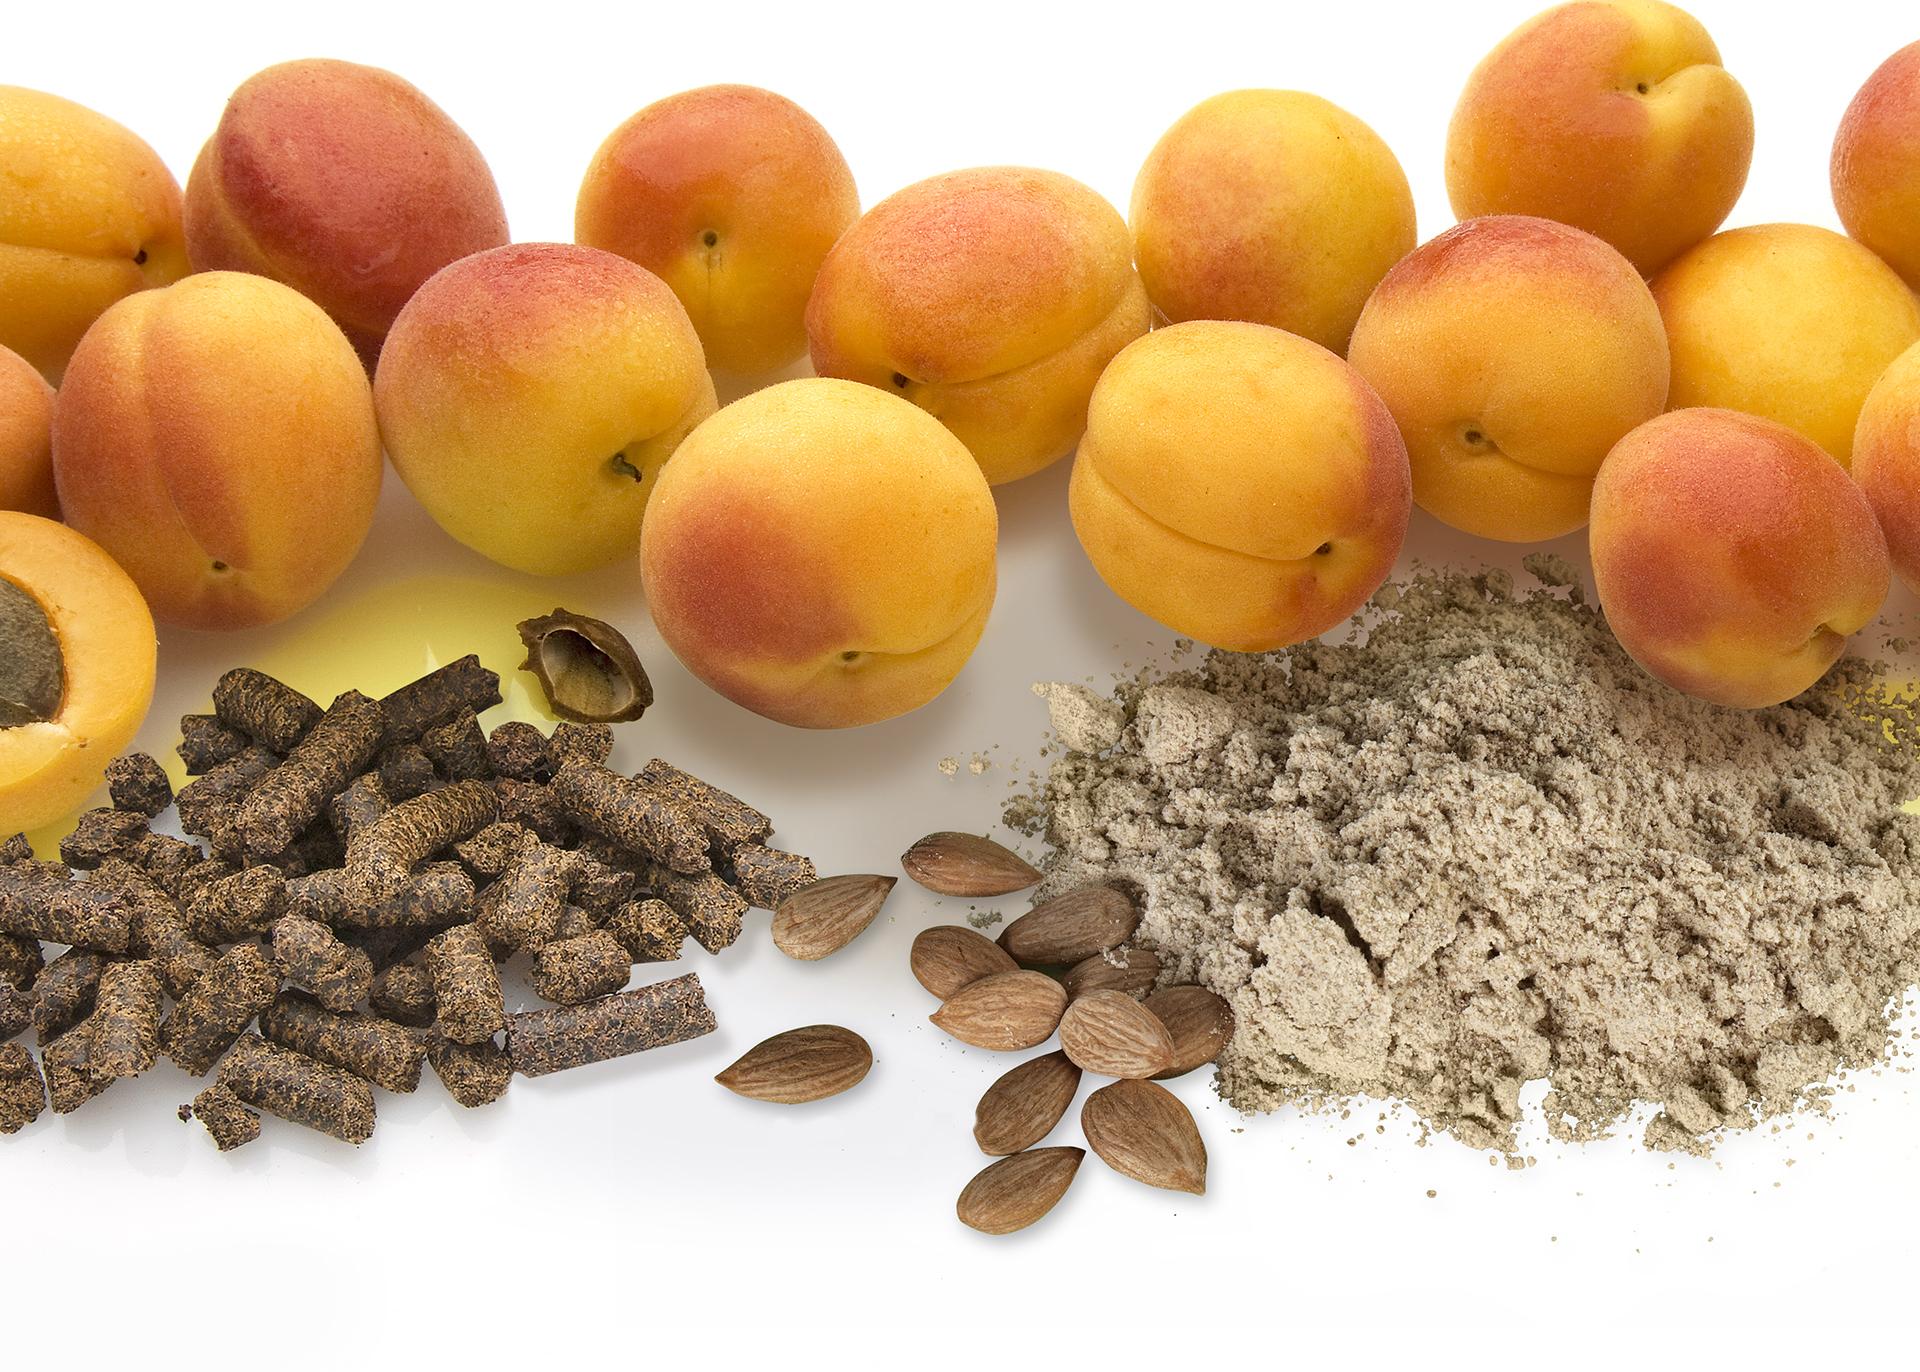 Apricot-Kernel-Press-Cake_Apricot-Kernel-Flour_Henry-Lamotte-Oils